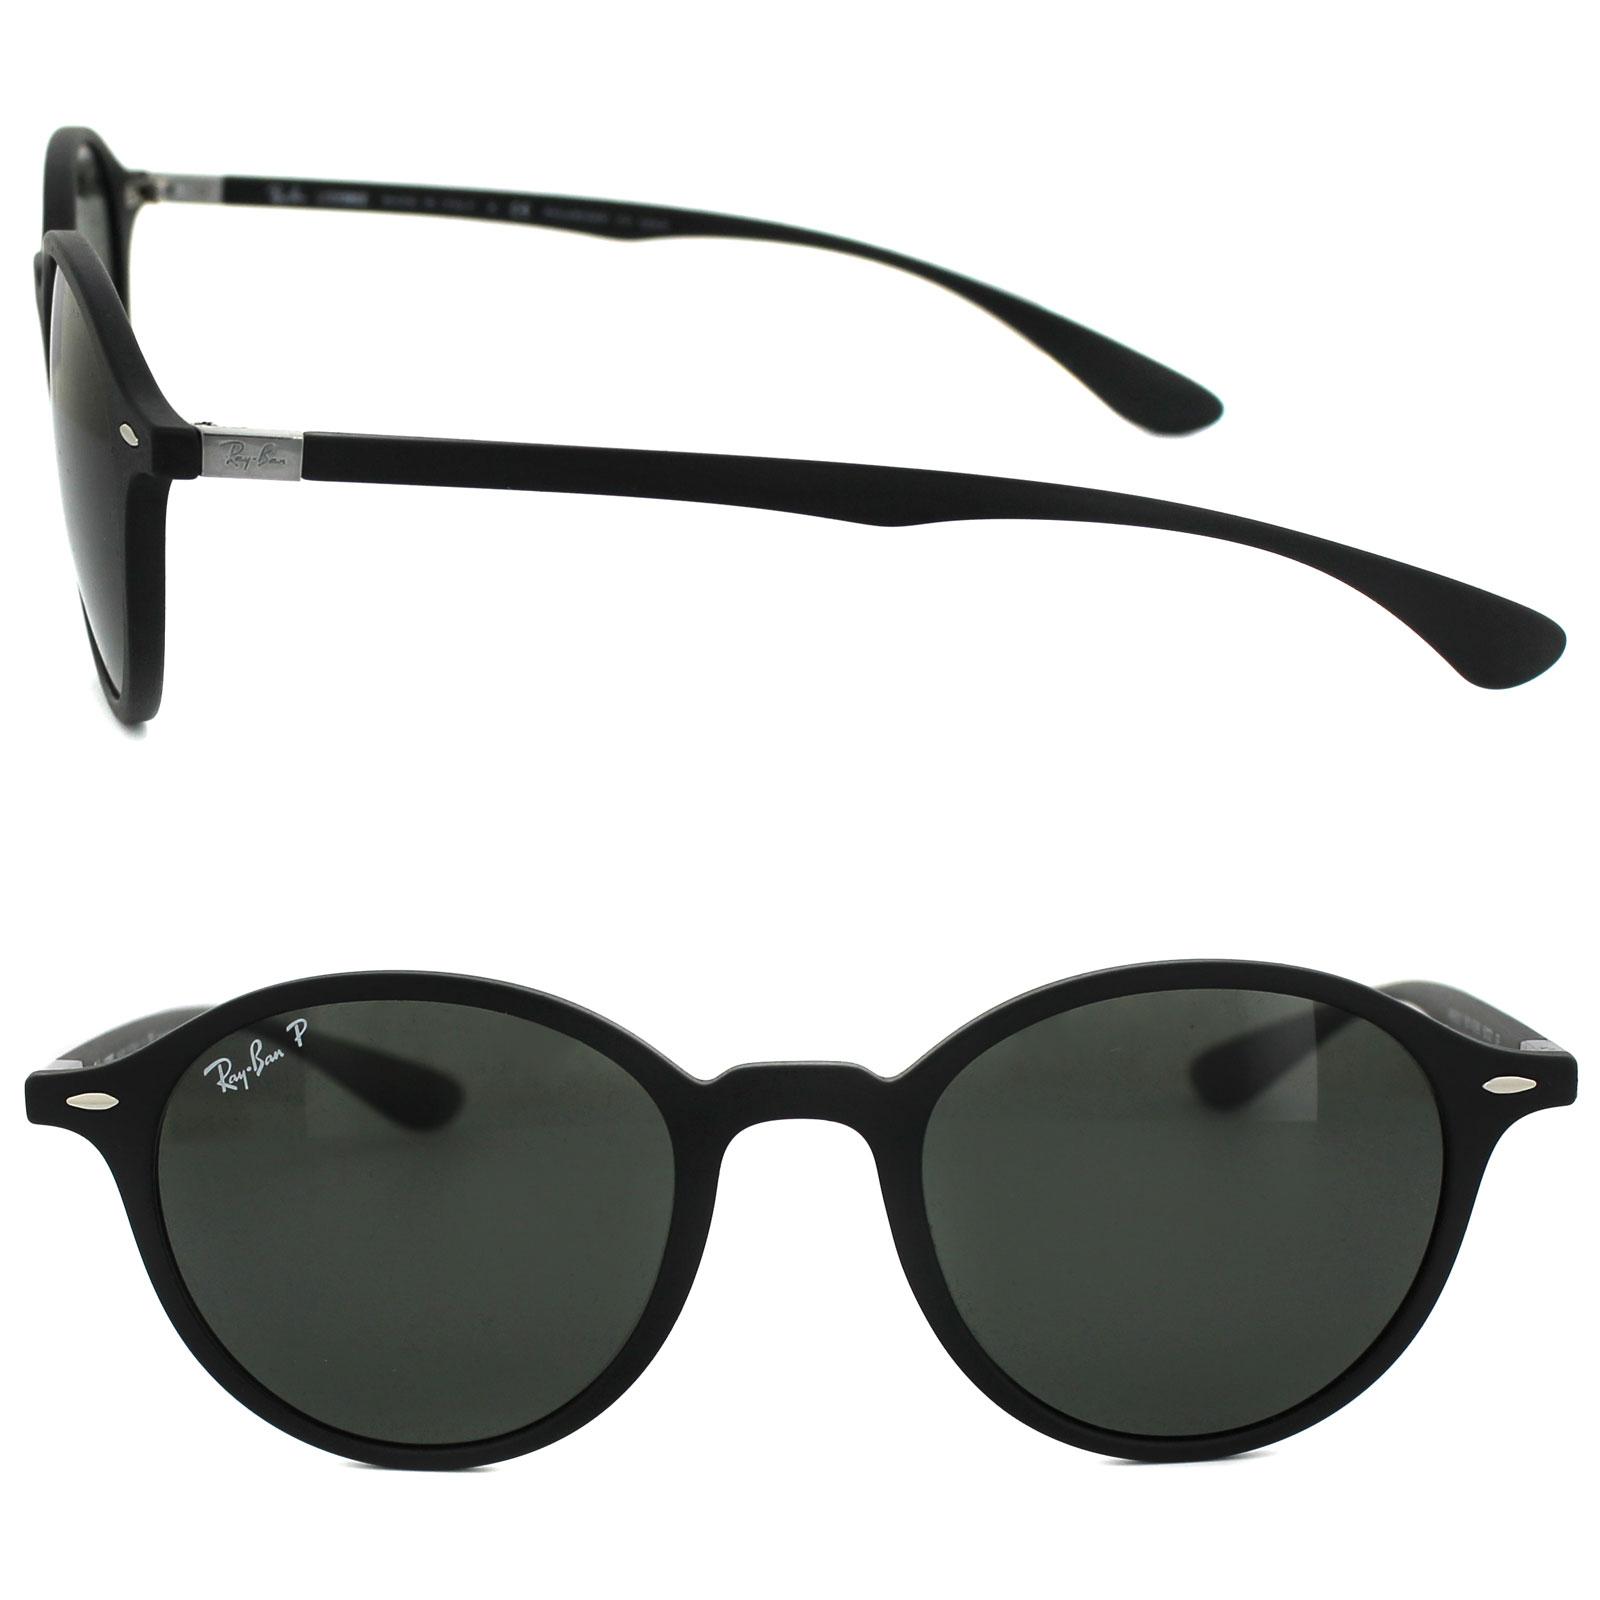 Ray Ban Round Sunglasses  ray ban round liteforce 4237 sunglasses ed sunglasses